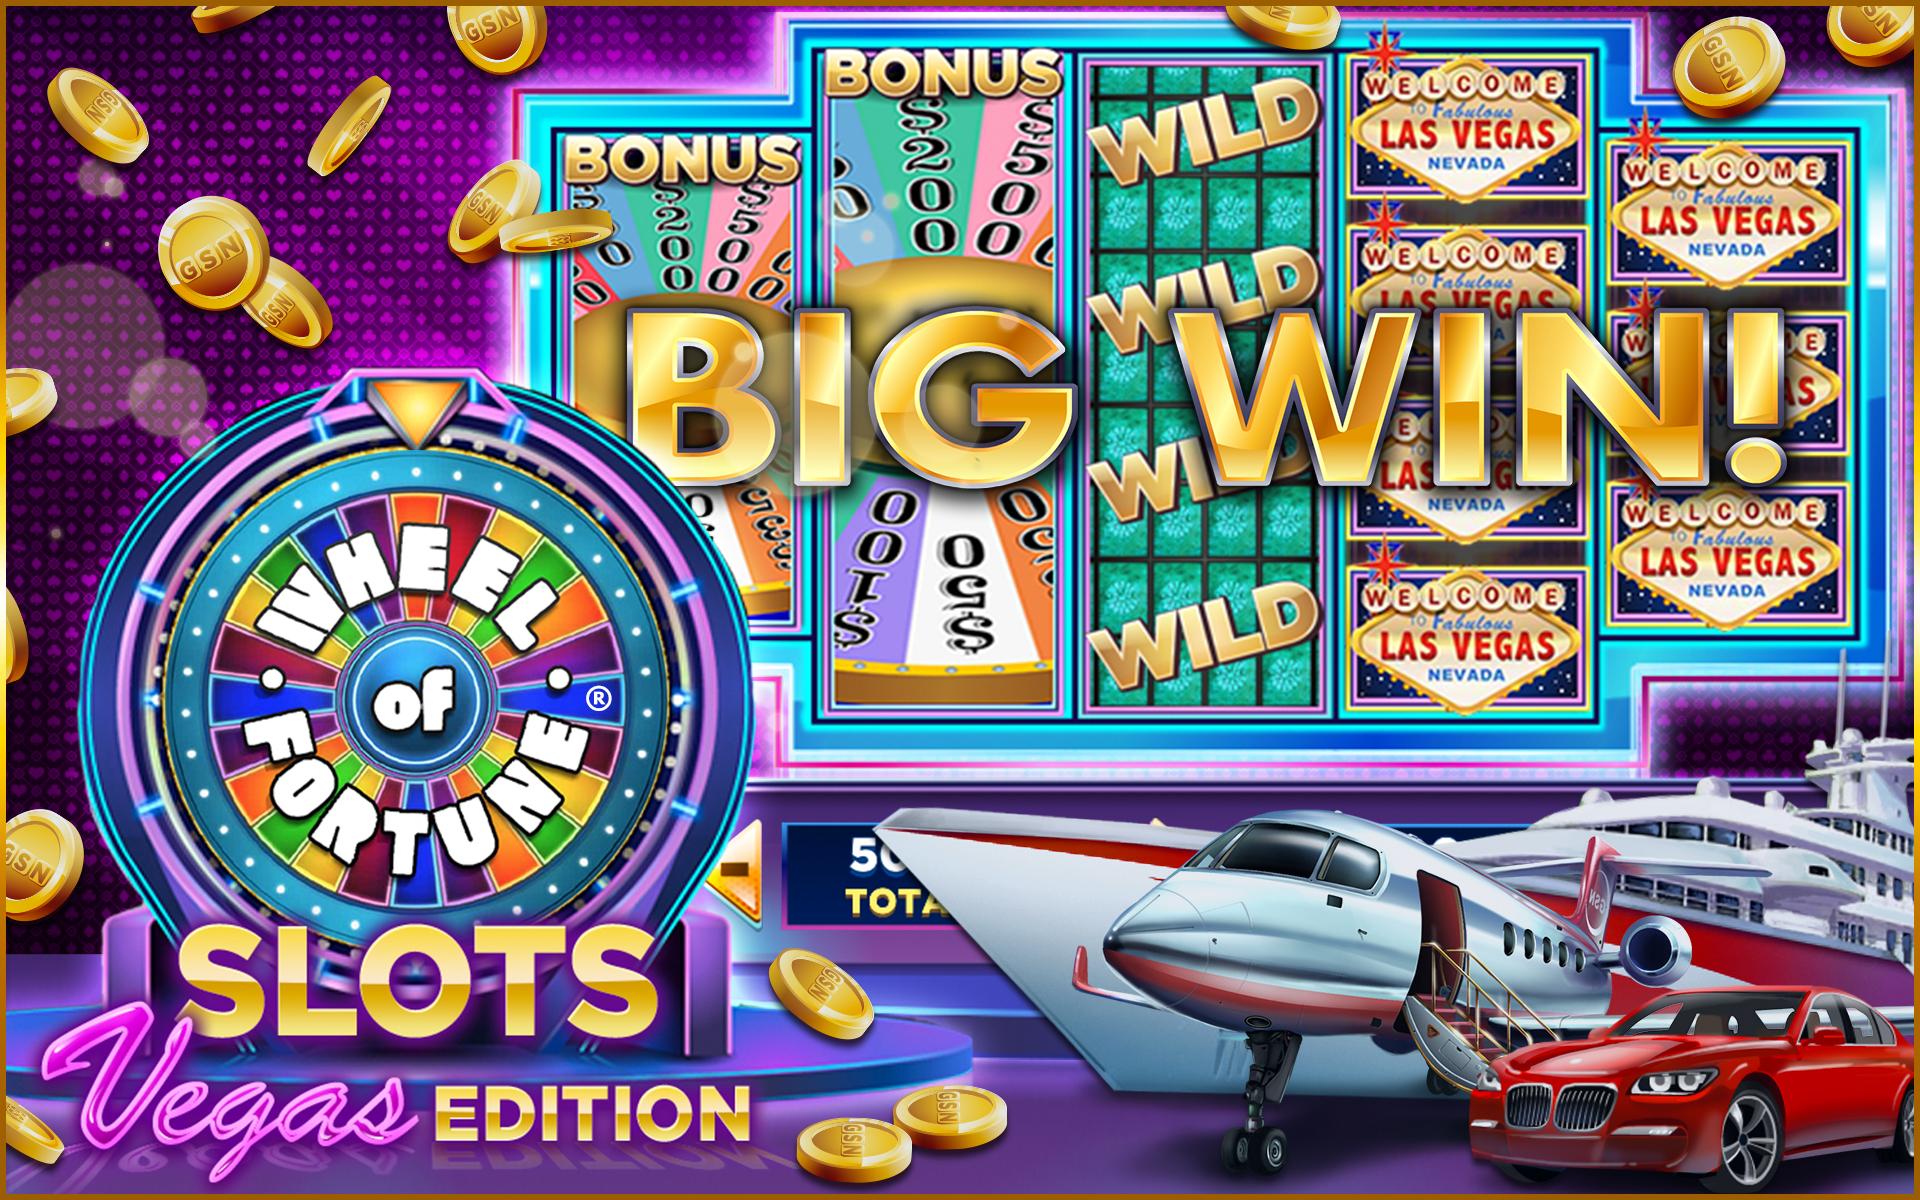 Spiele All American (Five Hand) - Video Slots Online